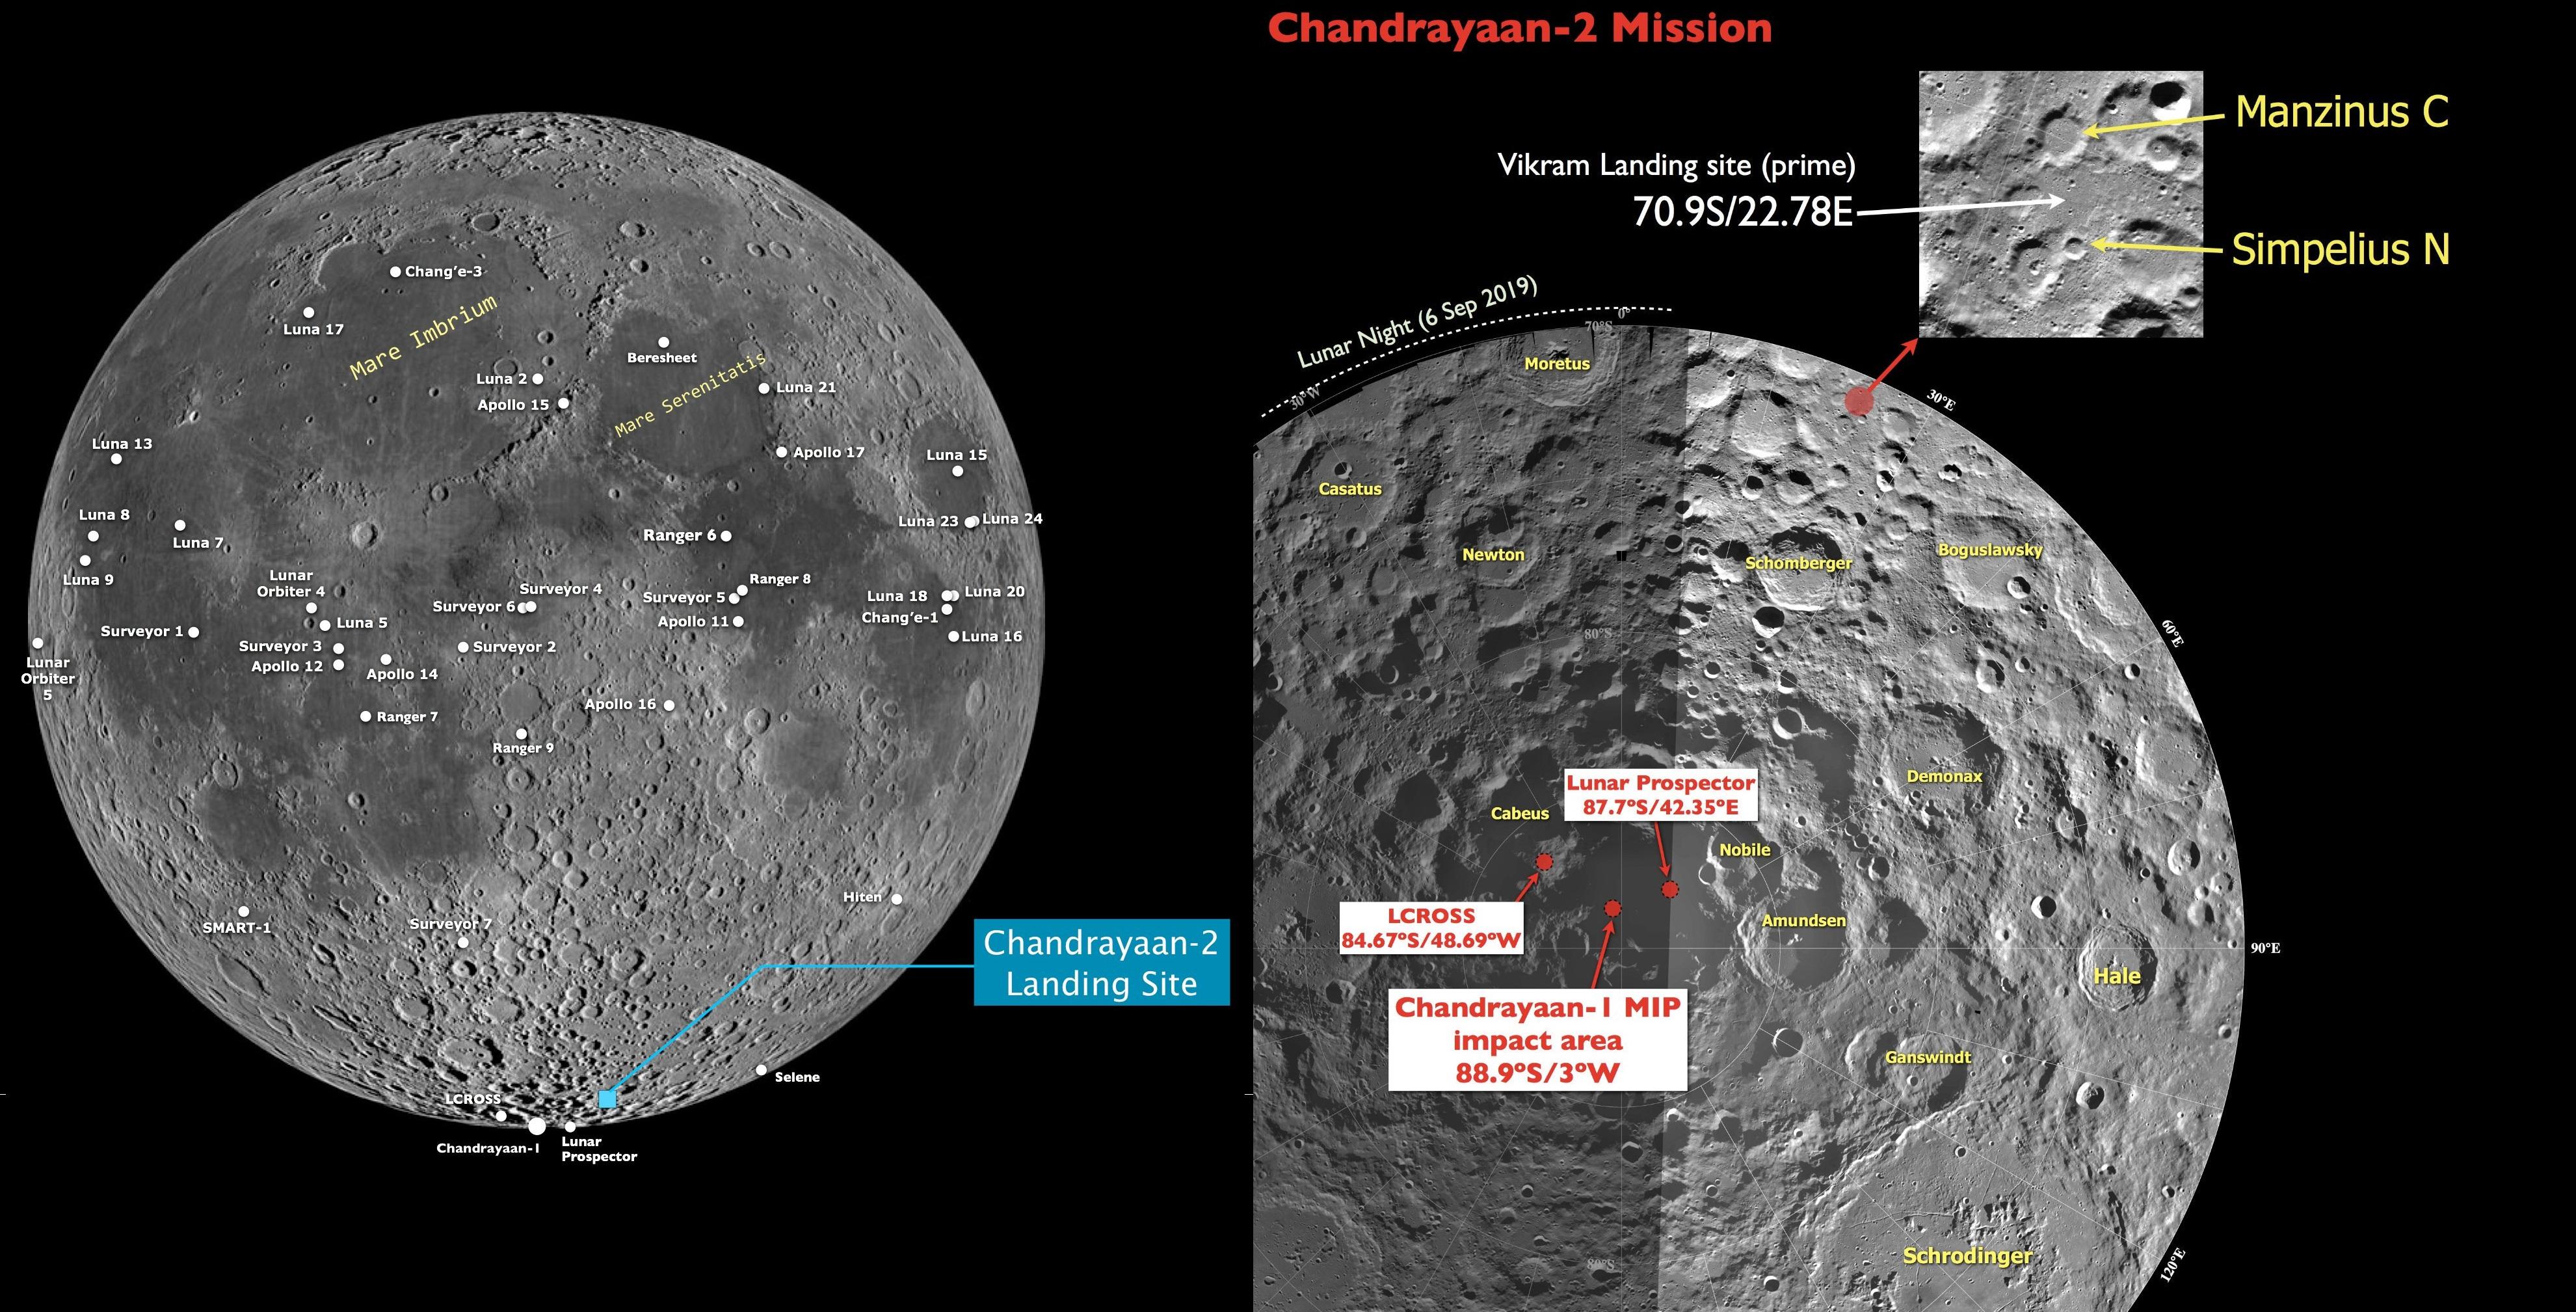 Chandrayaan-2 Landing Site